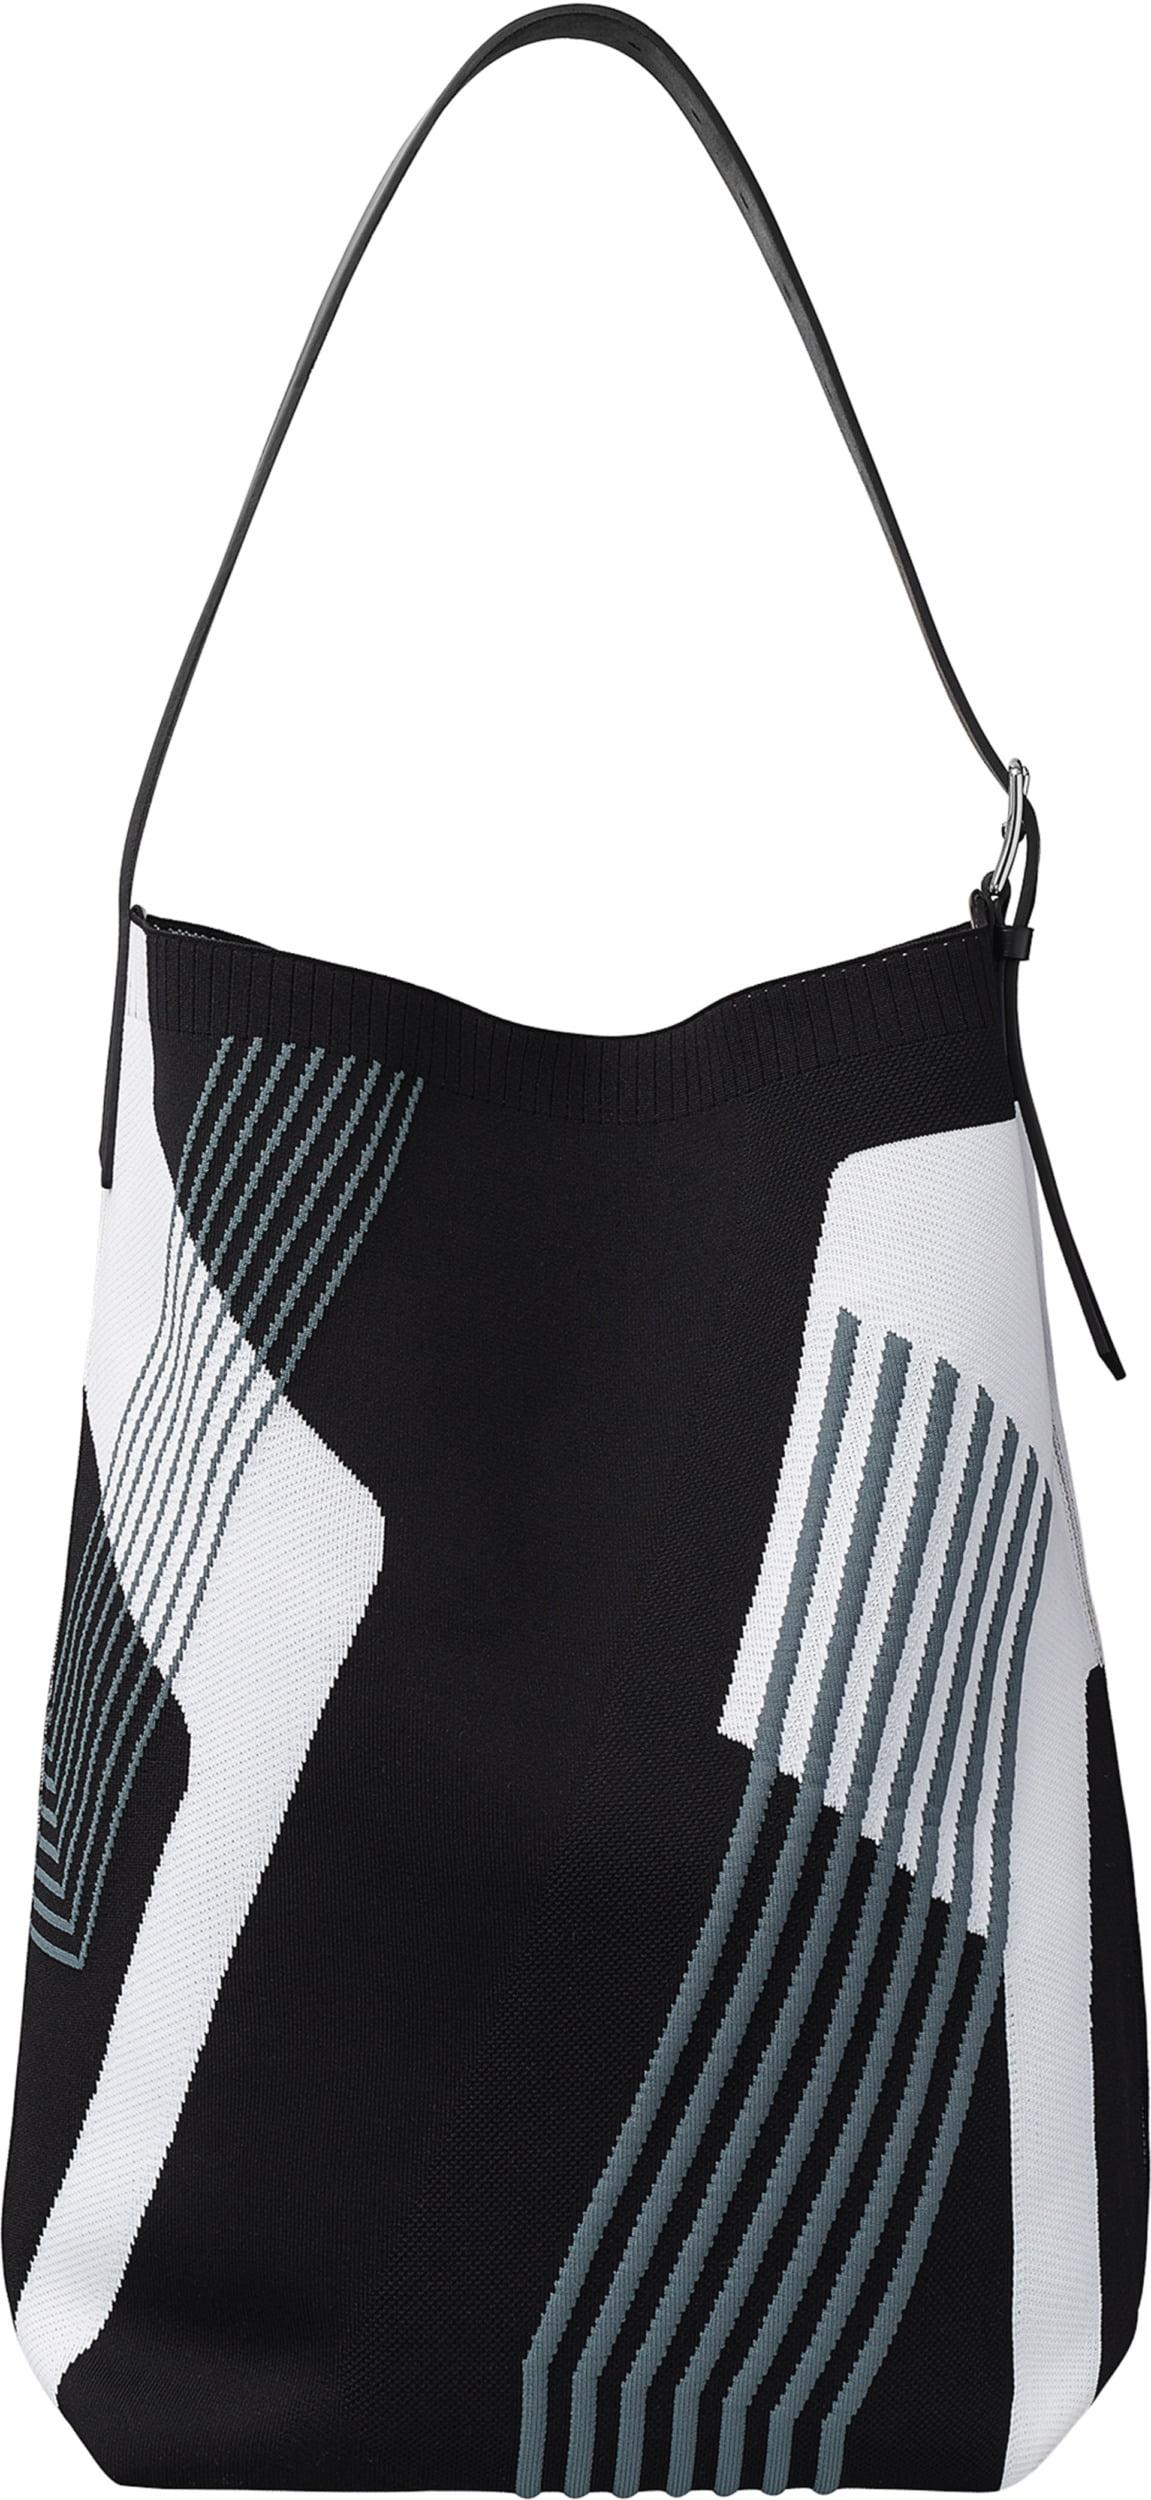 Etriviere shoulder MM dynamo bag by Hermès.